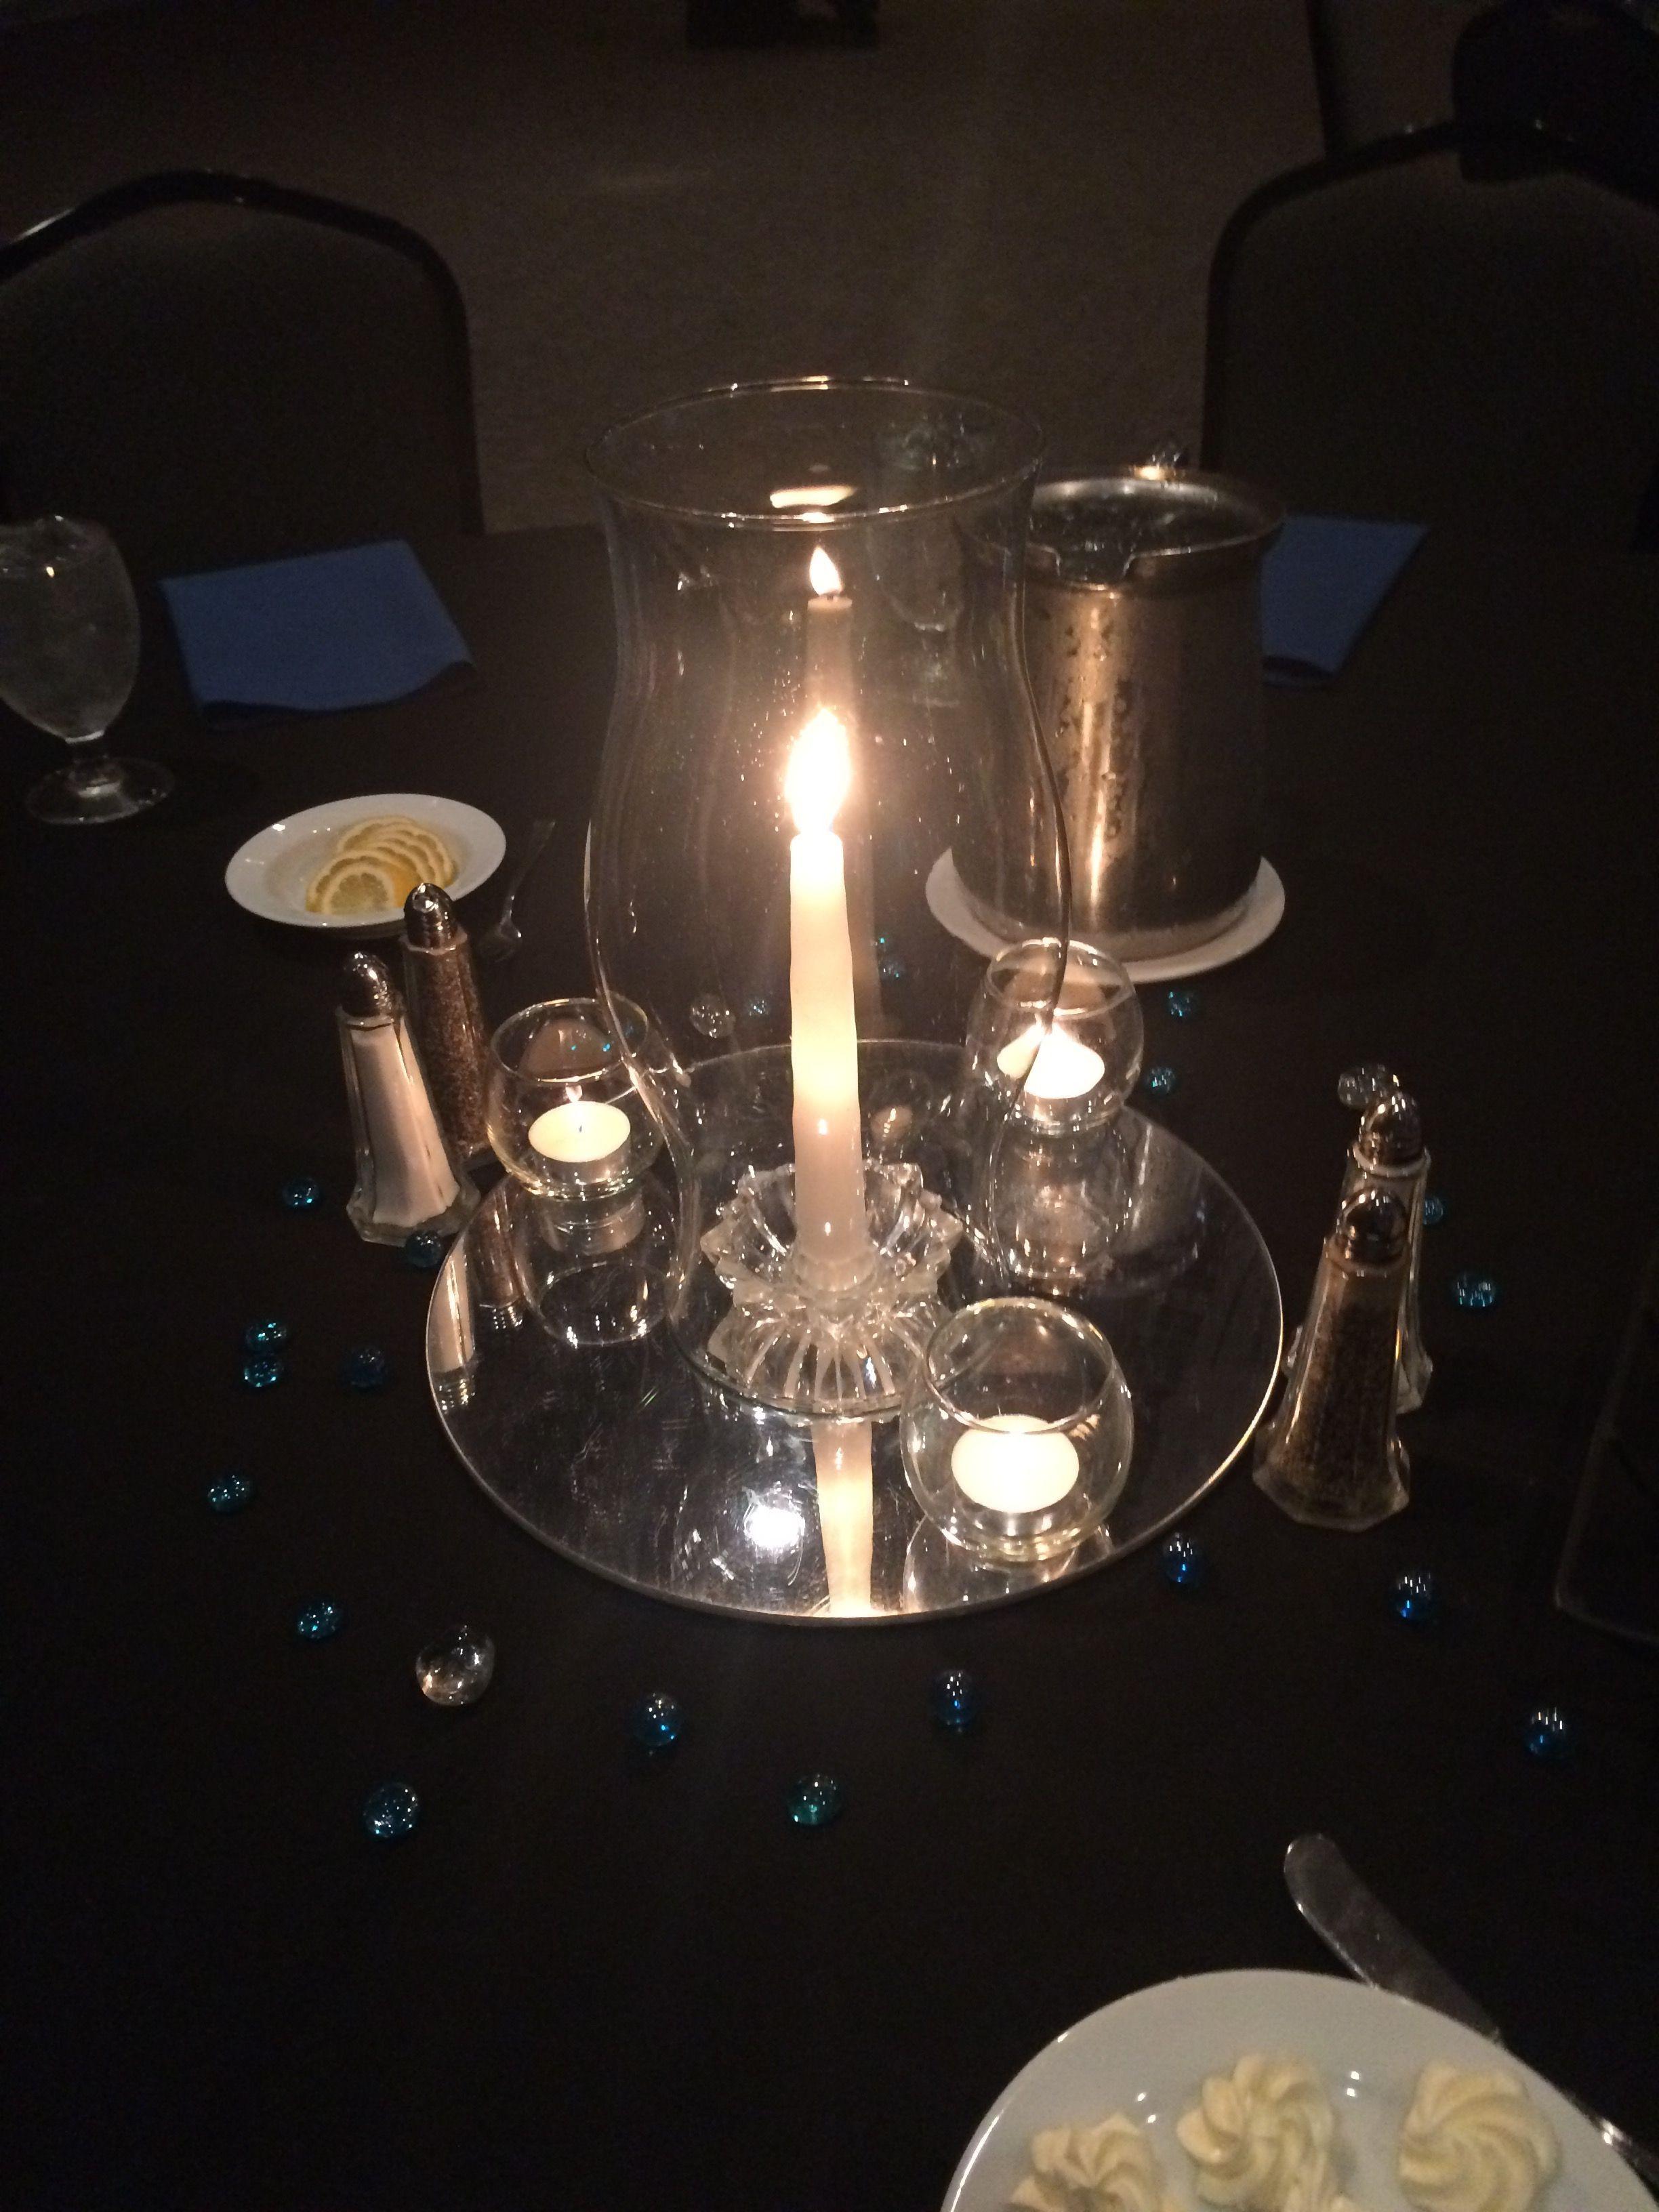 giant hurricane vase of large hurricane vase elegant hurricane vase with taper candle mirror with large hurricane vase elegant hurricane vase with taper candle mirror tile and votives unlimited